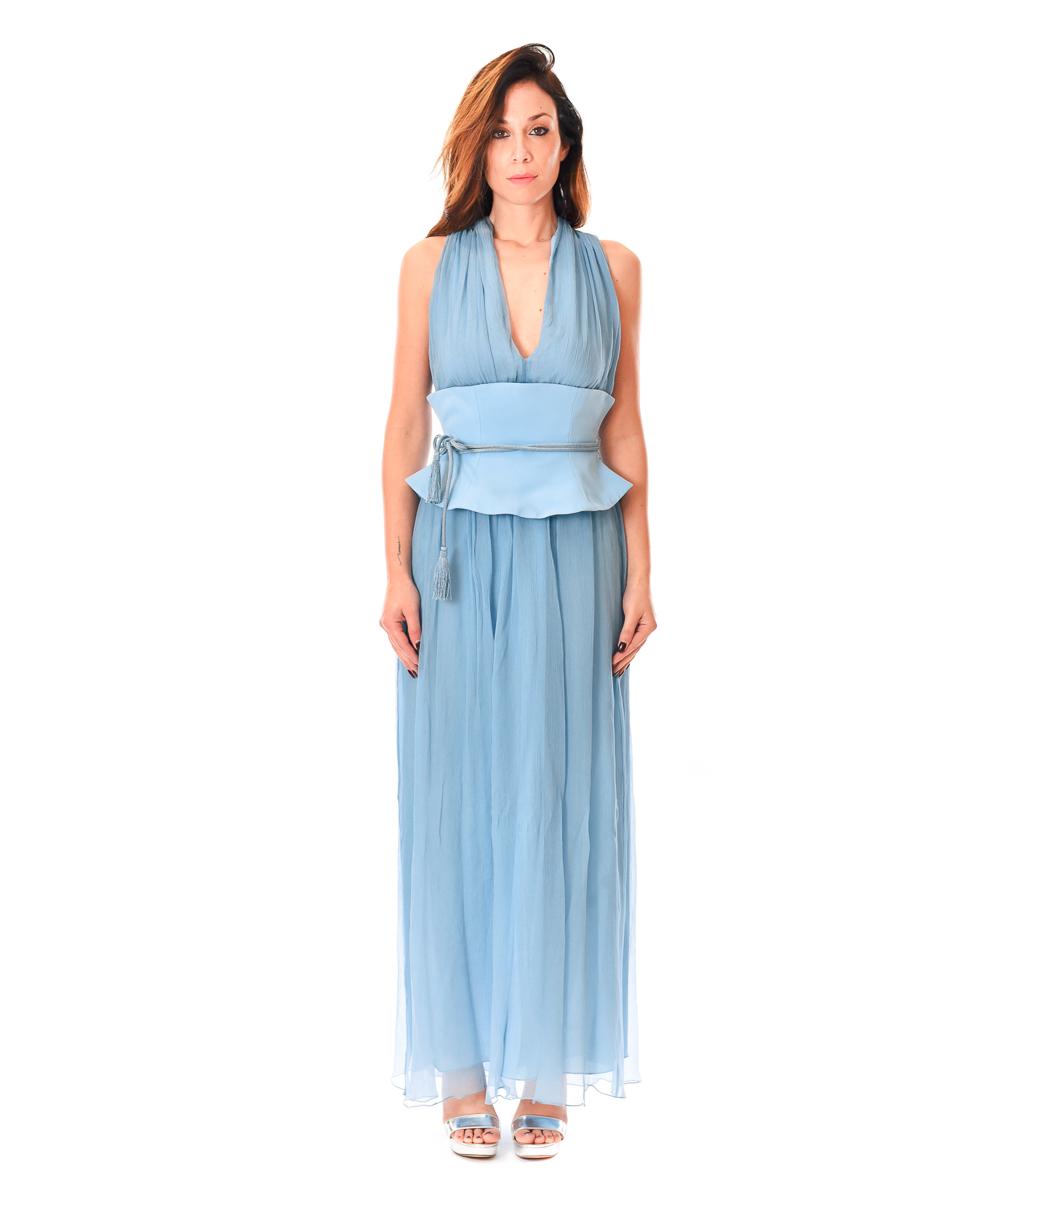 PATRIZIA PEPE ABITO DONNA COSMIC BLUE LONG DRESS SETA